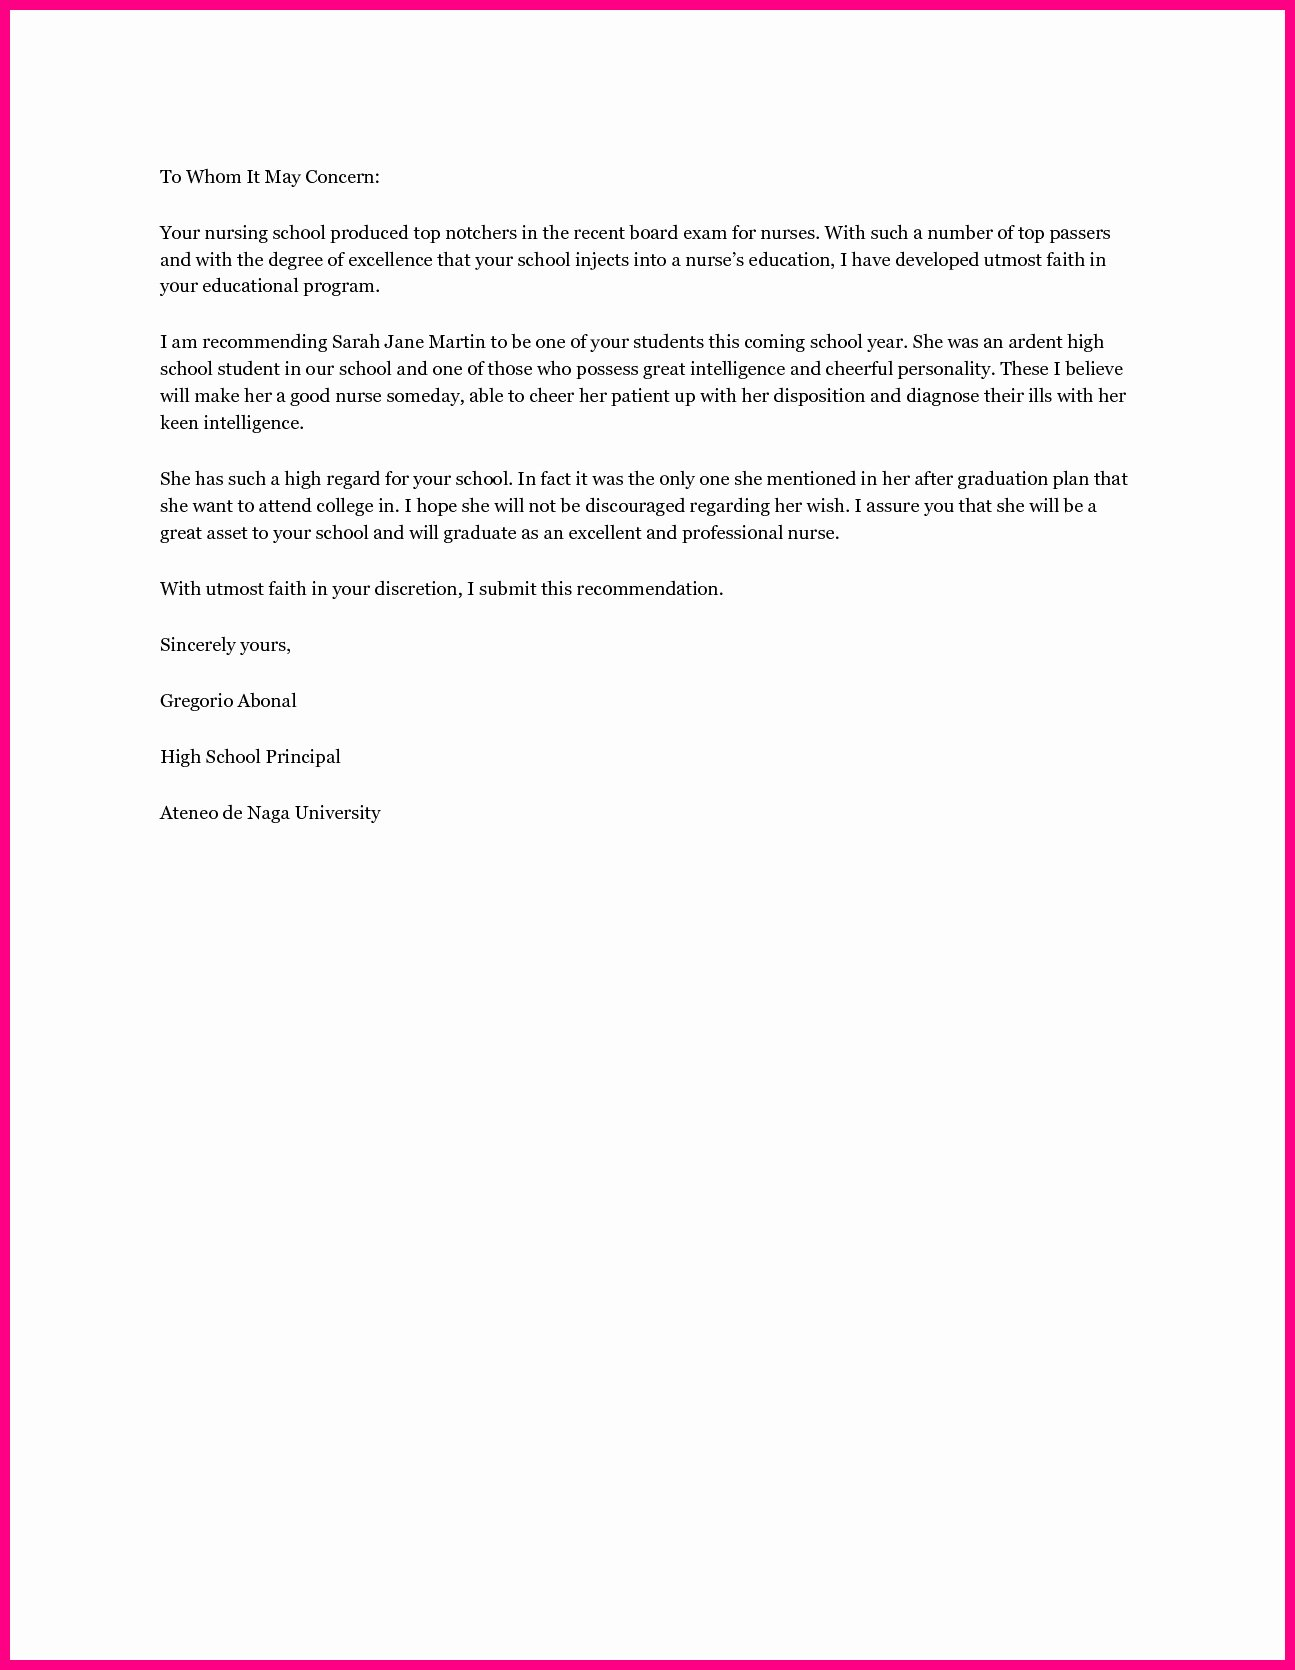 Nursing School Recommendation Letter Elegant Nursing School Re Mendation Letter Template Samples